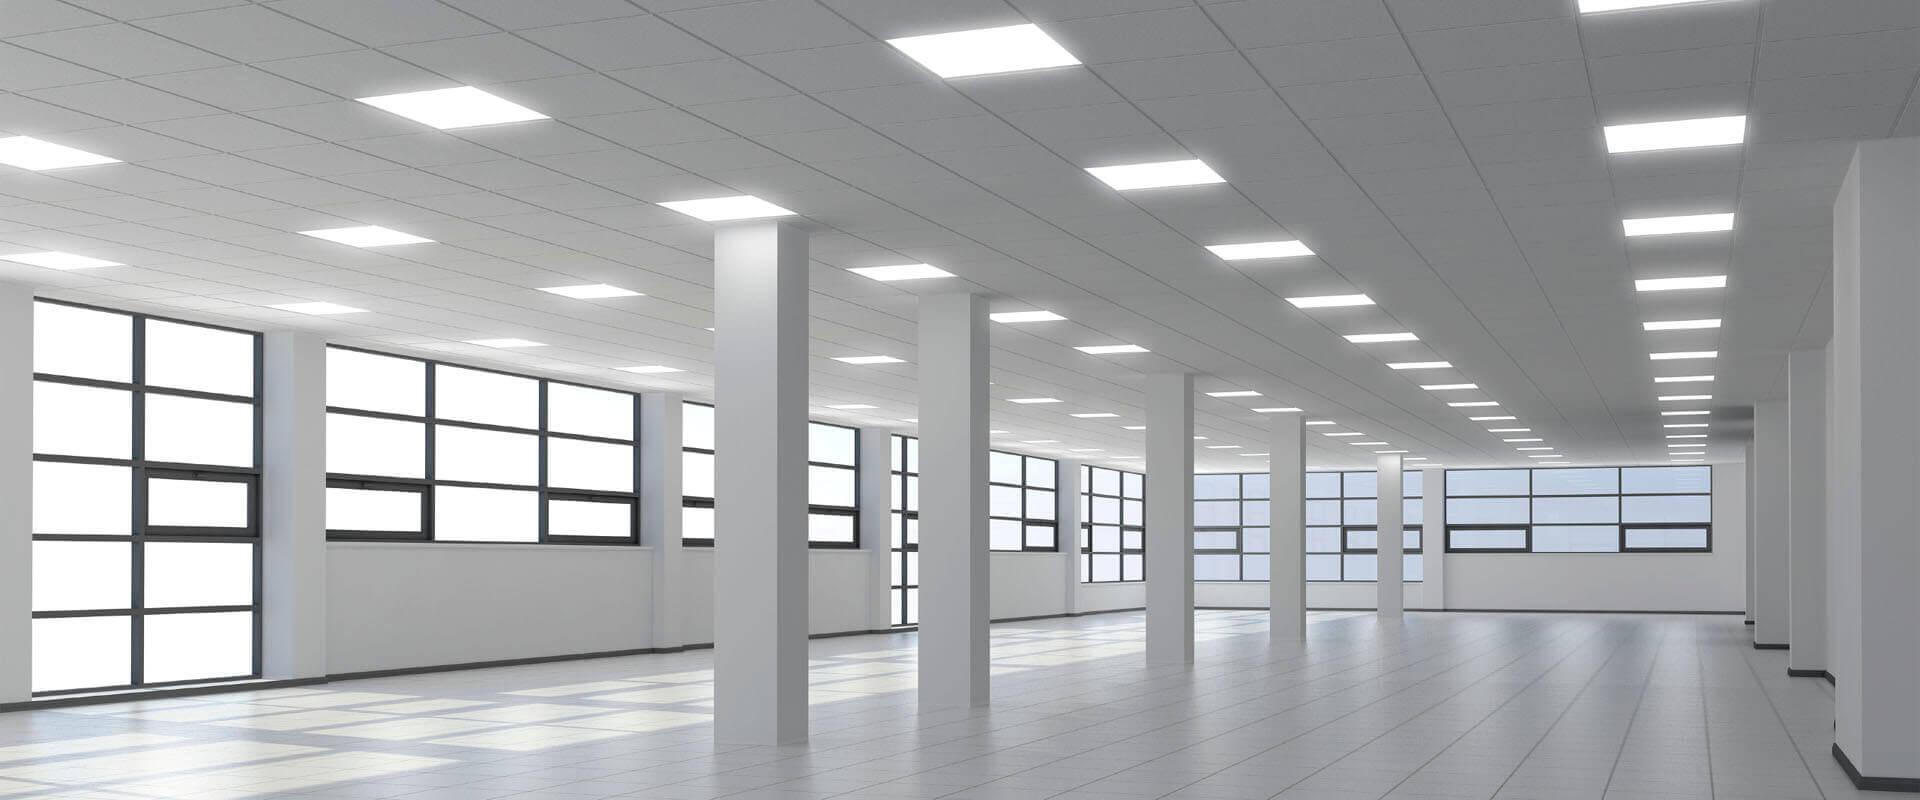 LED lighting services in Tilbury